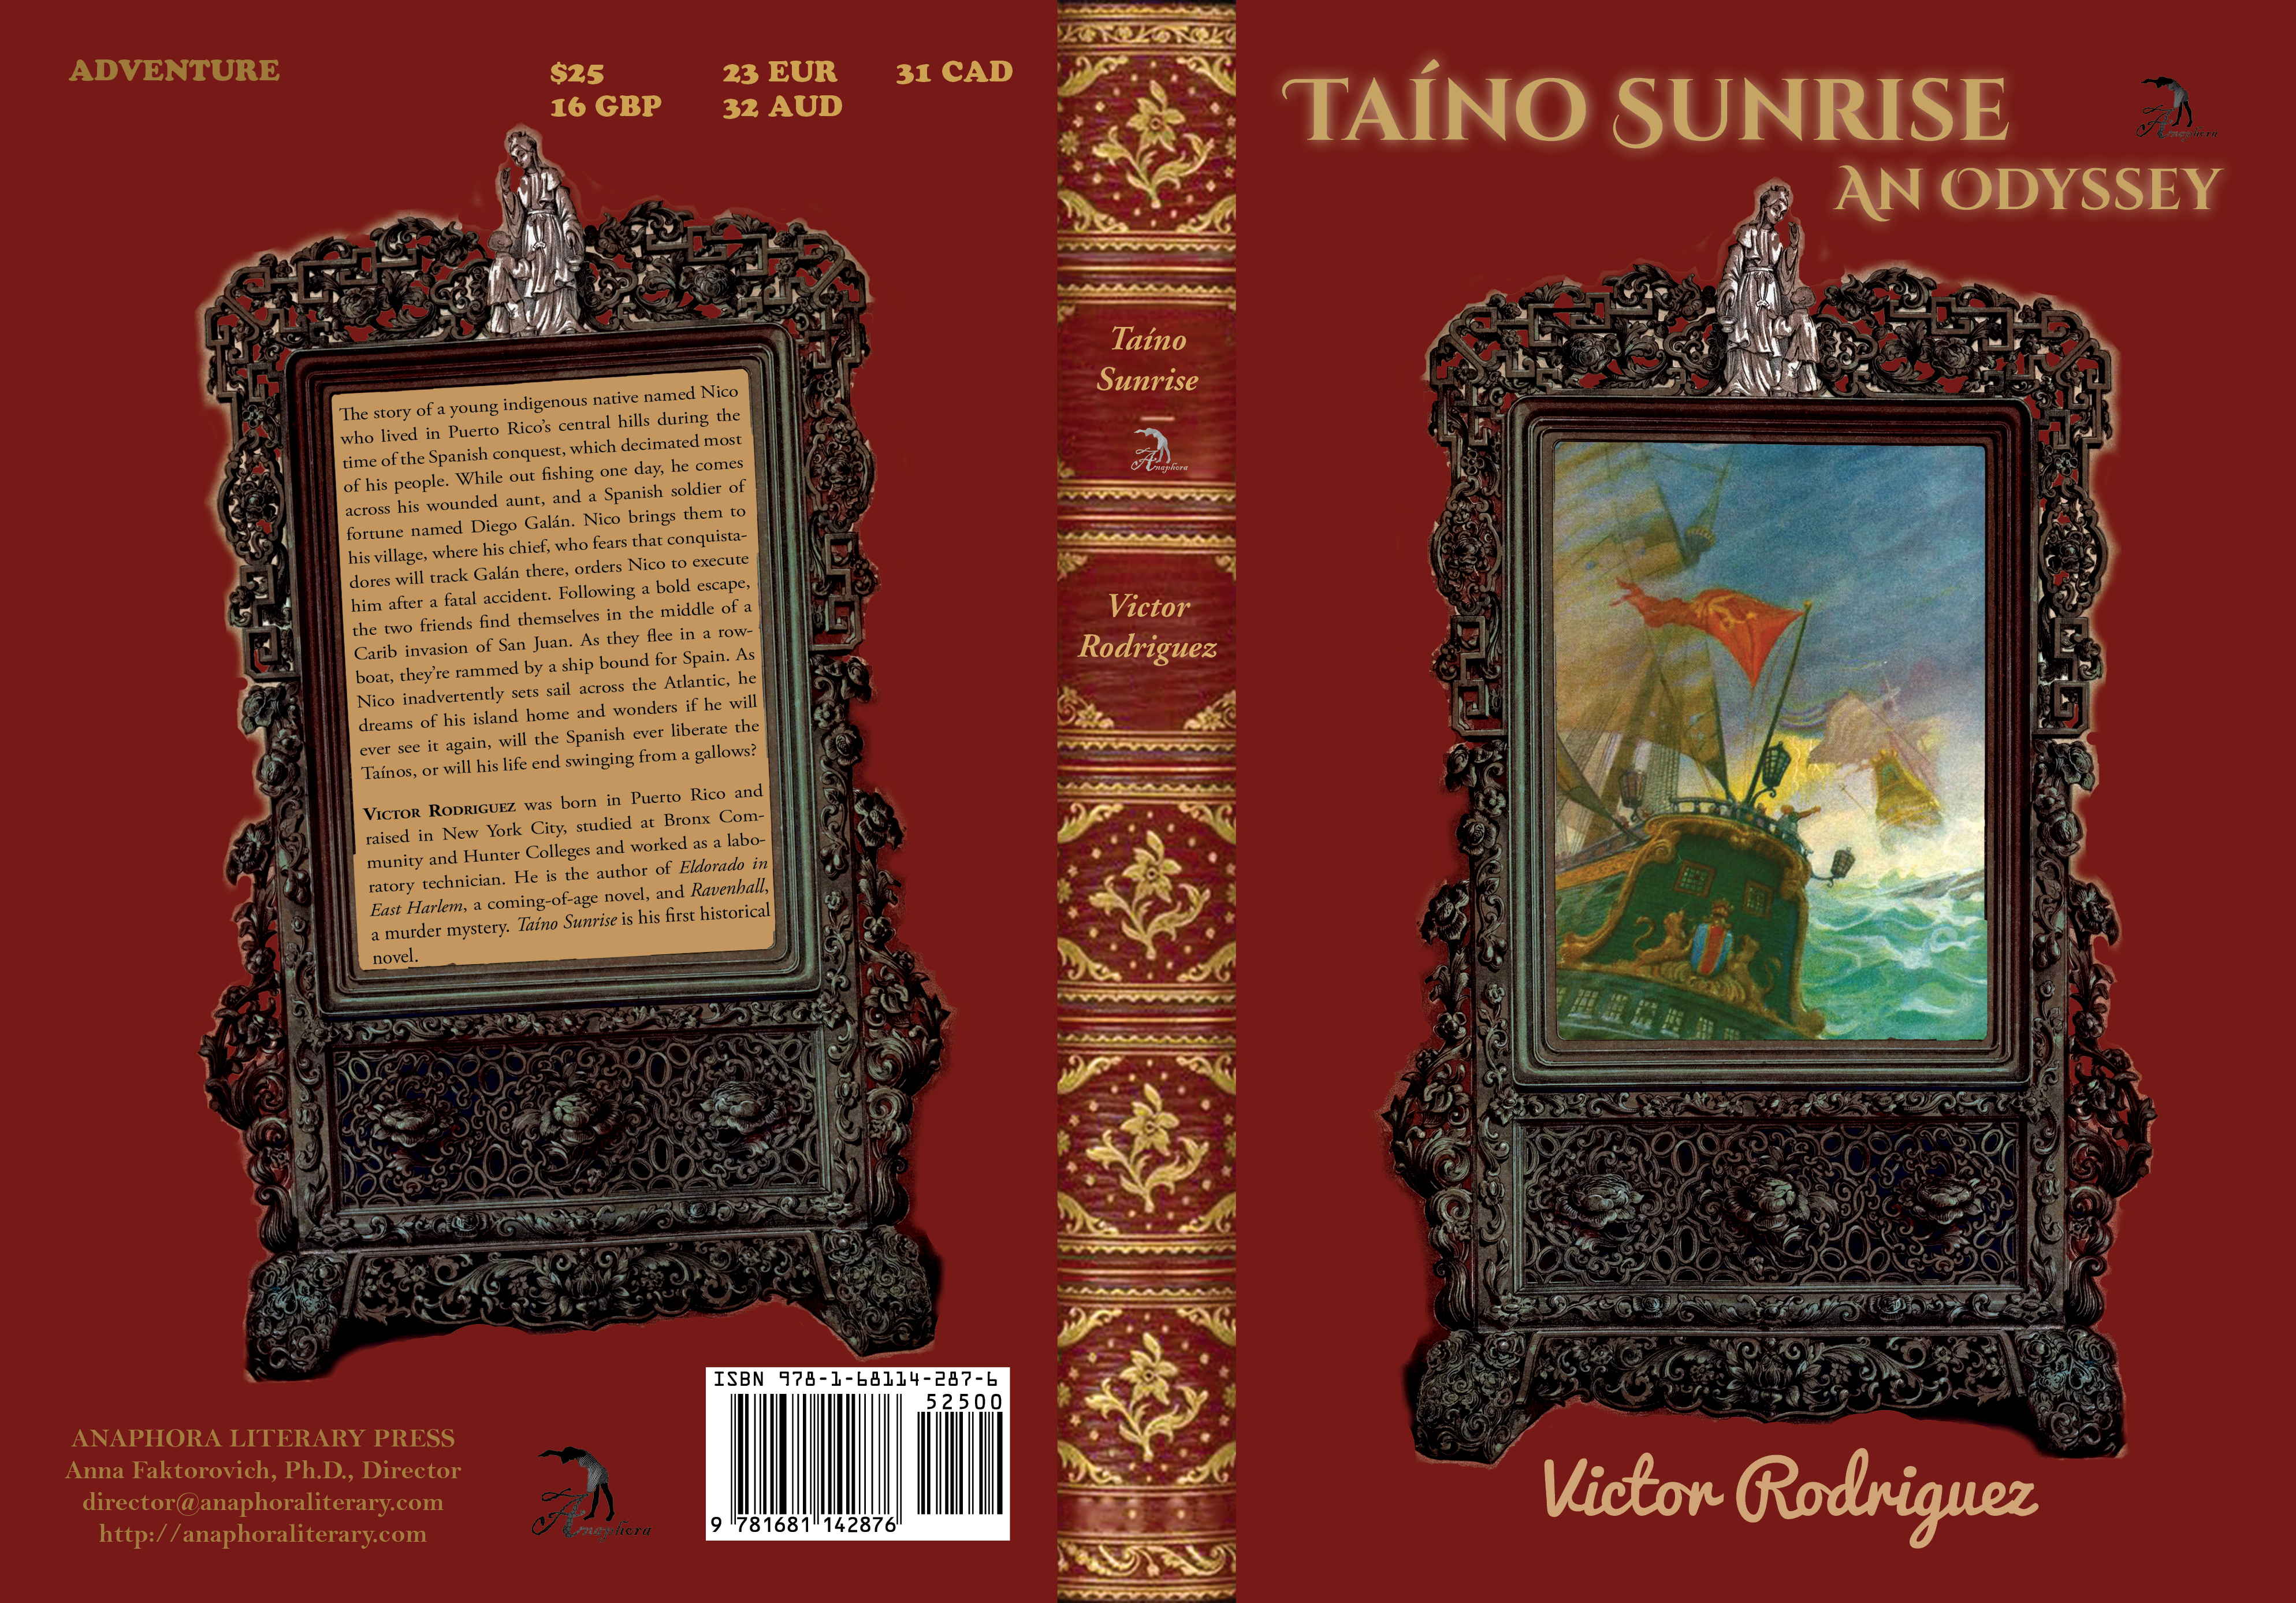 Victor Rodriguez Anaphora Literary Press